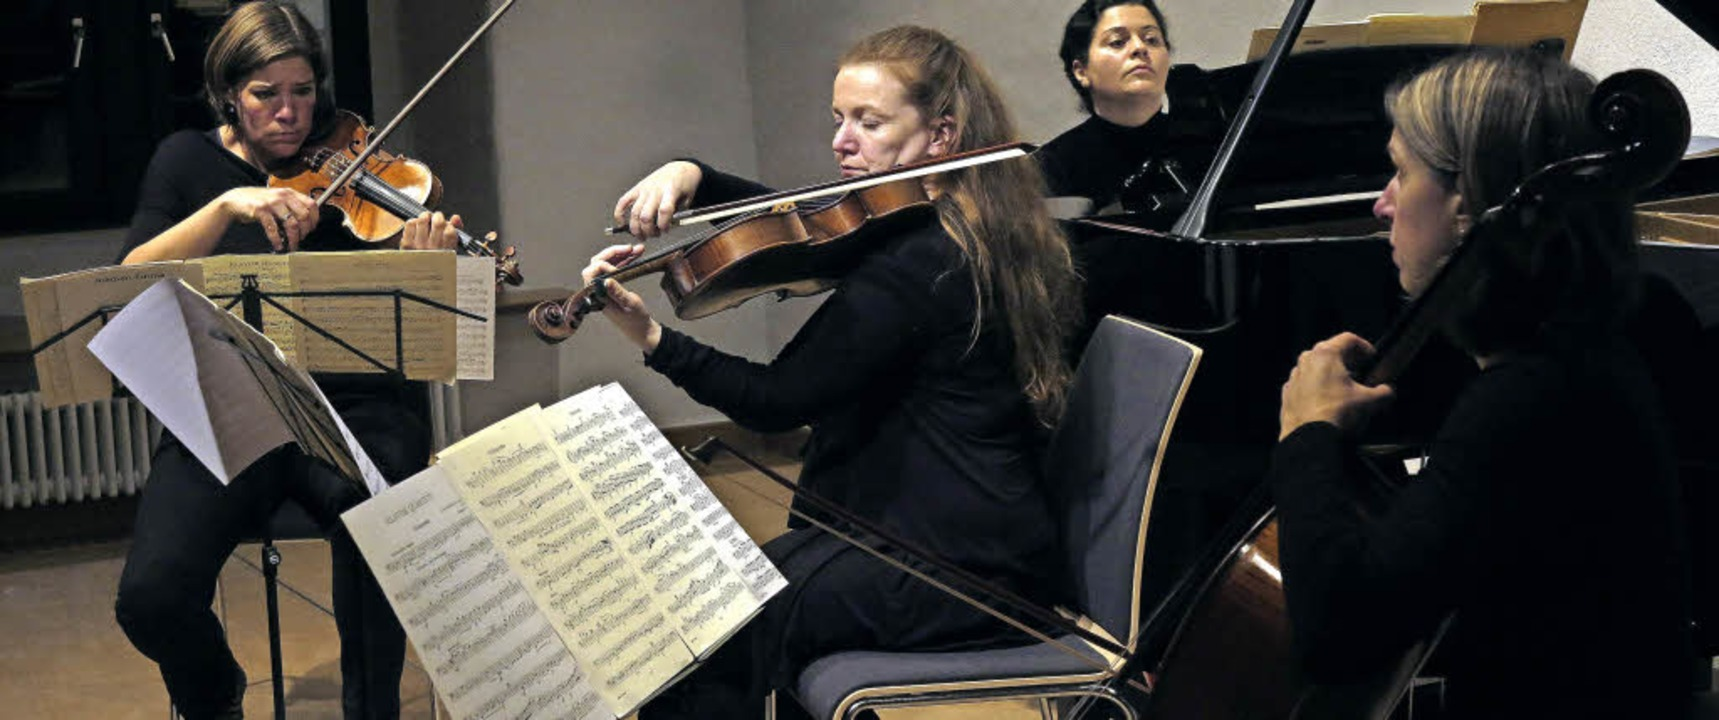 Das Janus-Ensemble und die Pianistin Karina Cveigoren  | Foto: D.Philipp